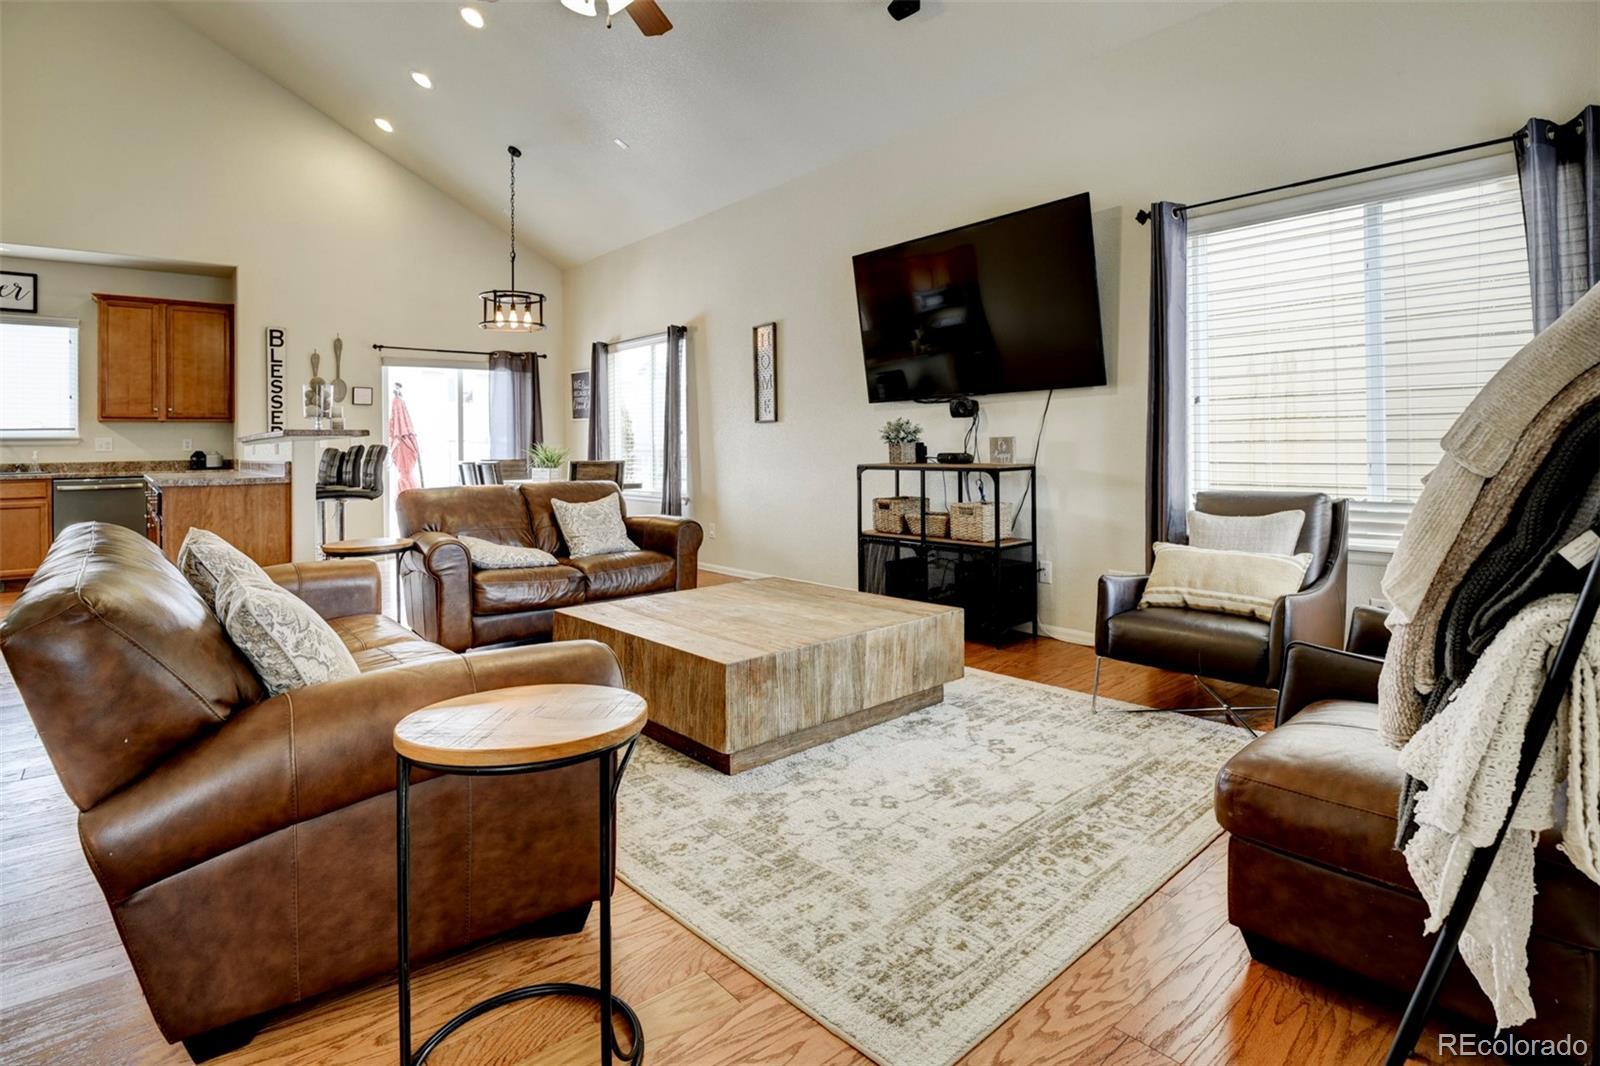 MLS# 7612924 - 4 - 6139 Rocking Chair Lane, Colorado Springs, CO 80925